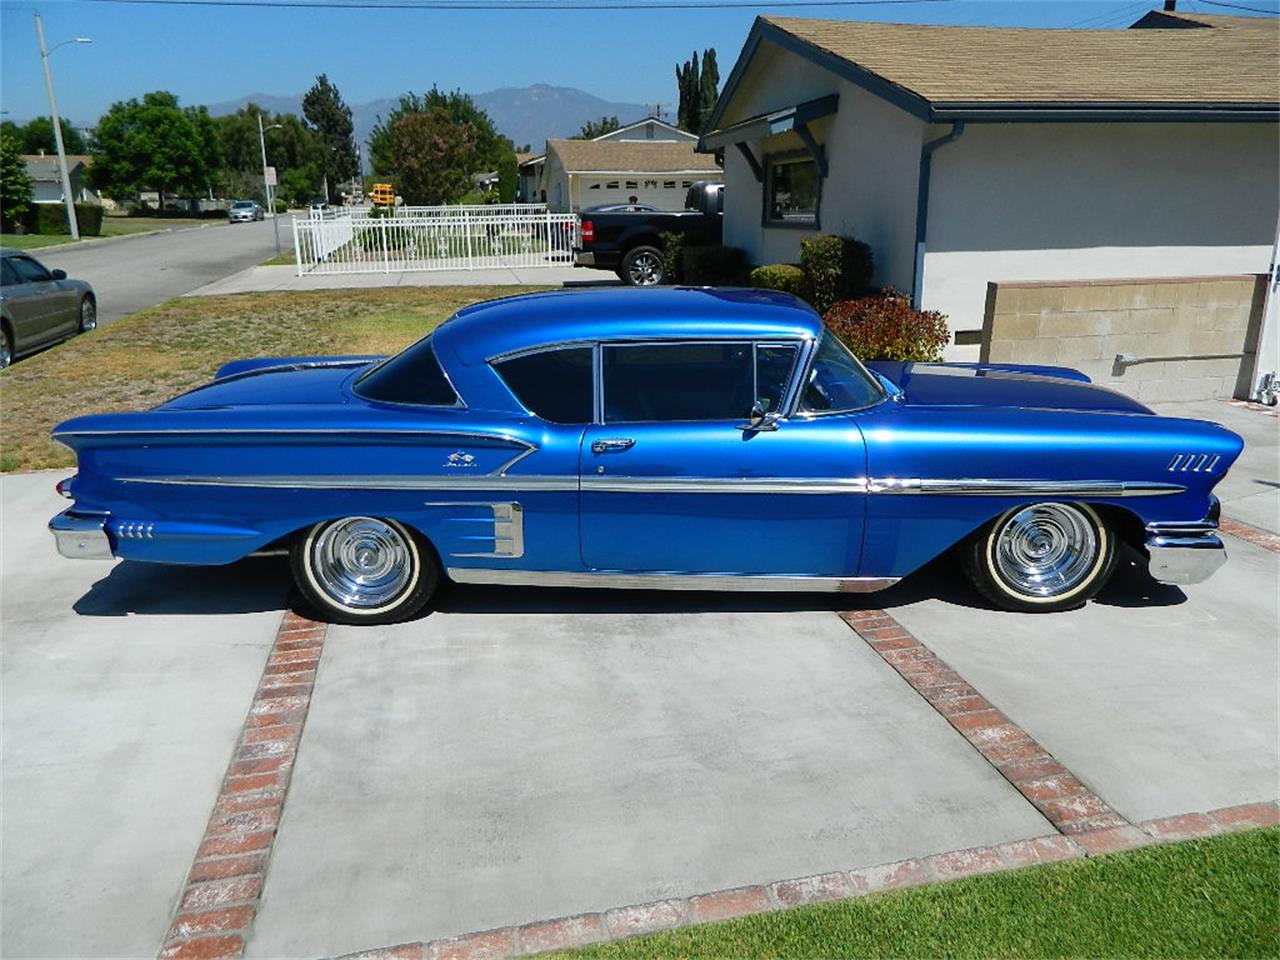 Classic Cars For Sale California Usa: 1958 Chevrolet Impala For Sale